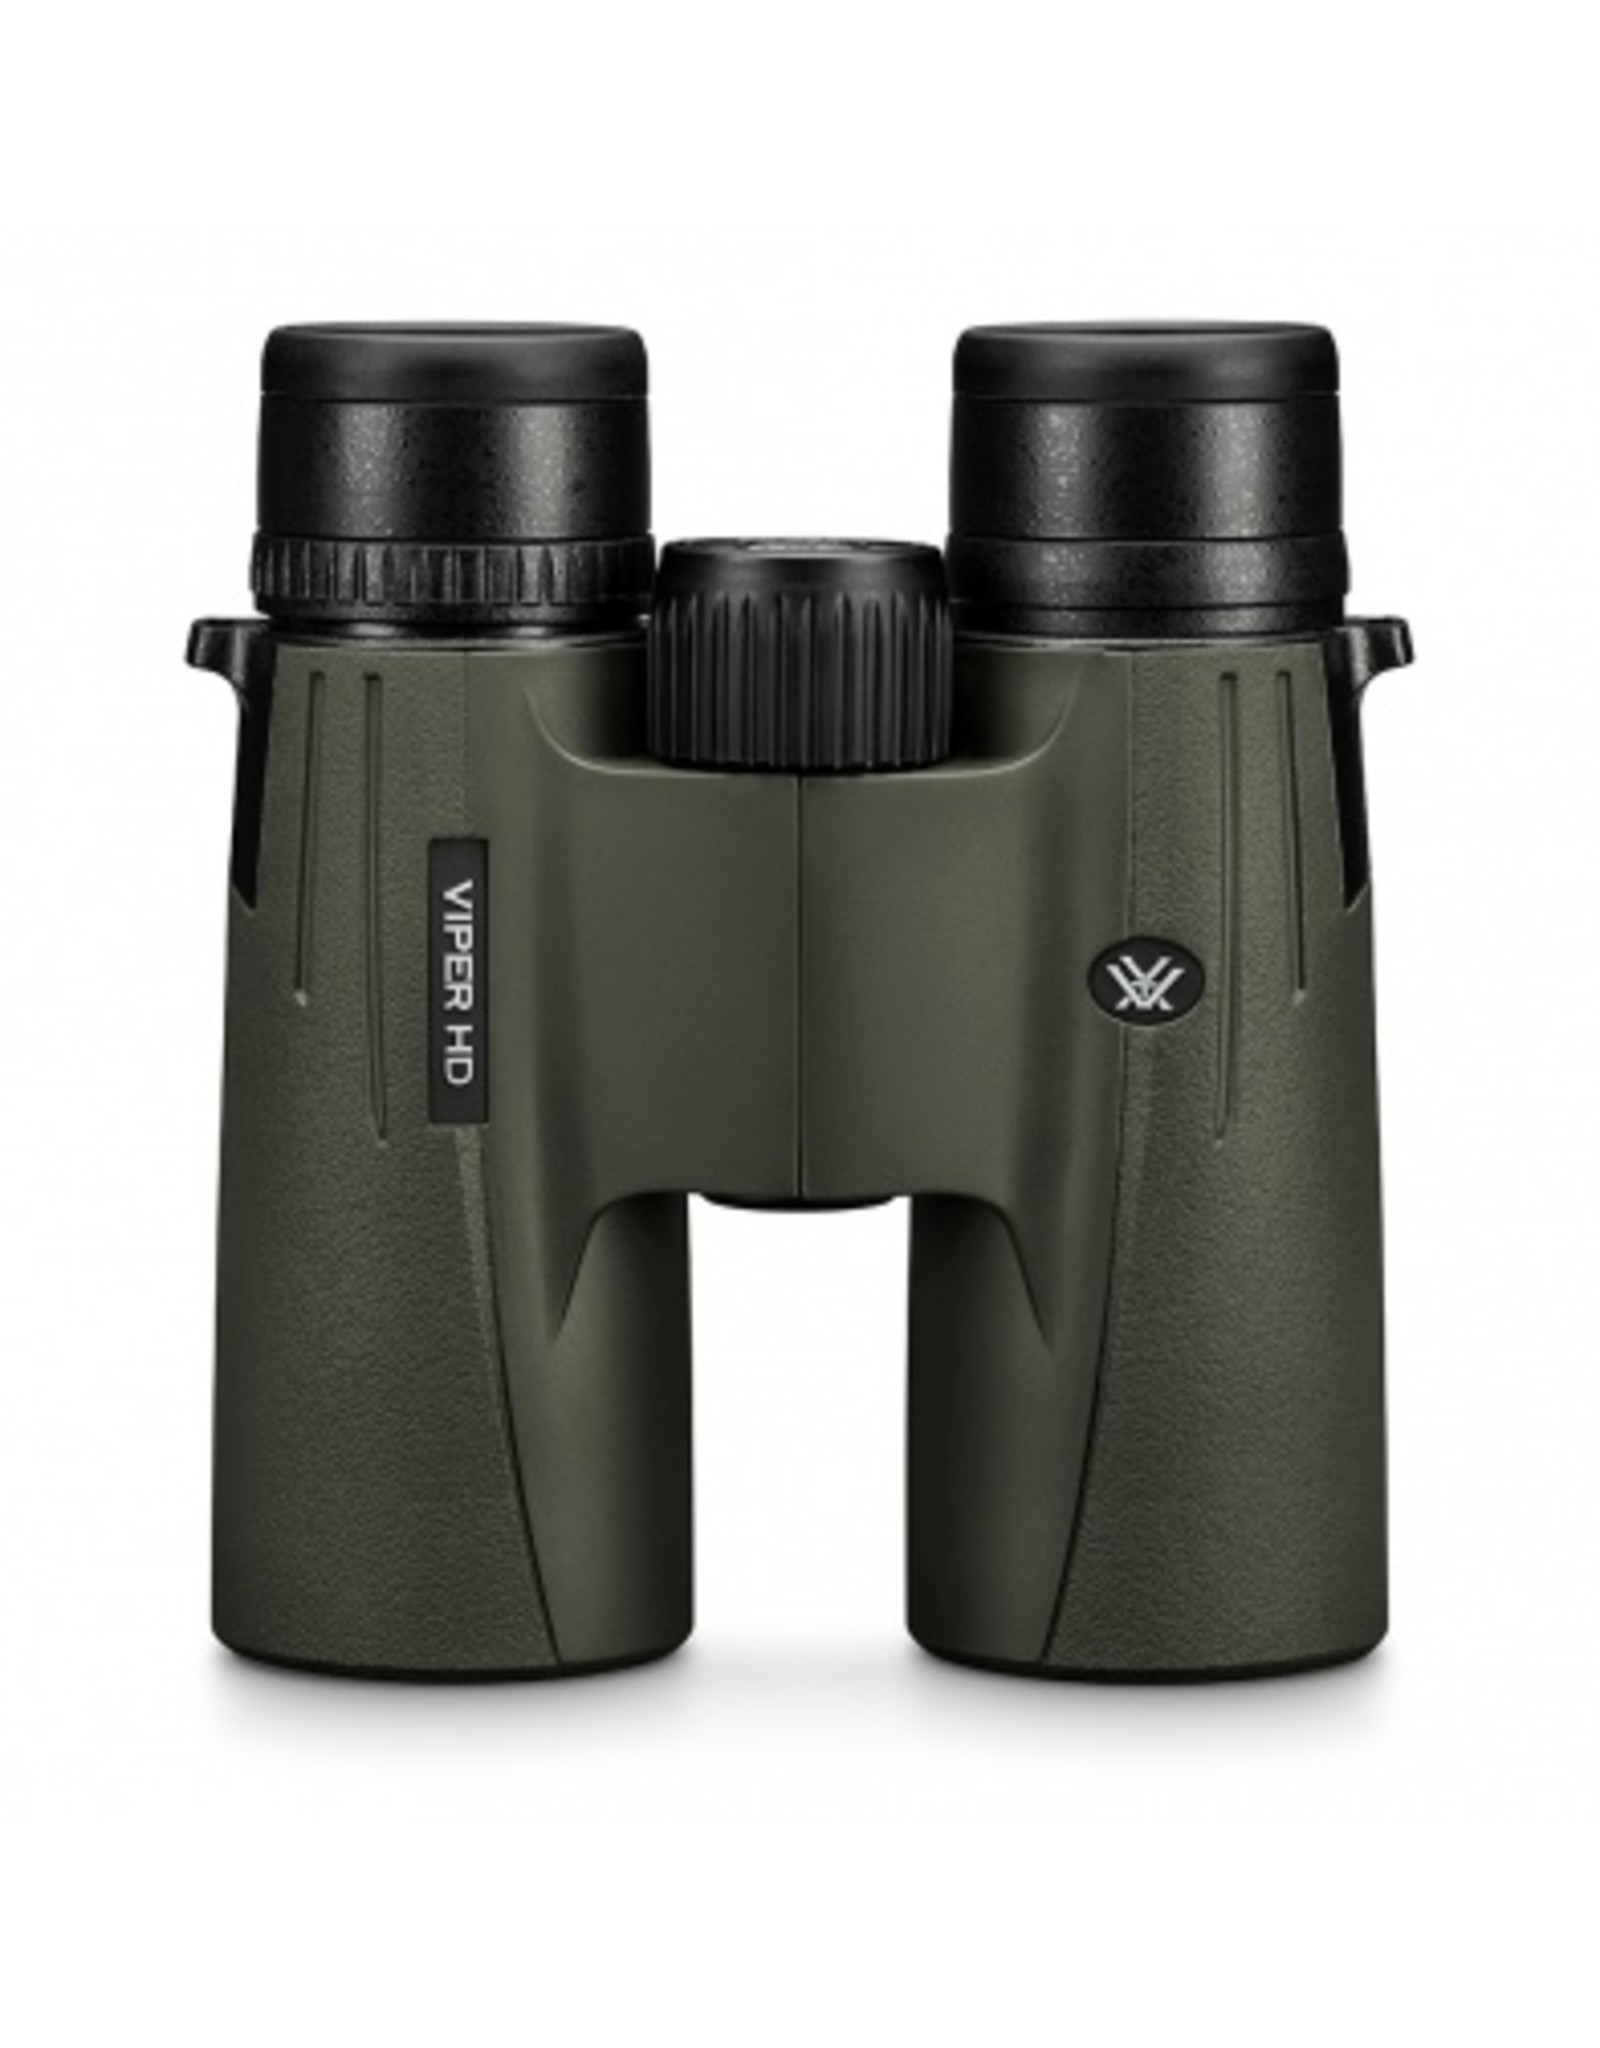 Vortex Optics VT-V200 Vortex Viper HD 8x42 Binoculars